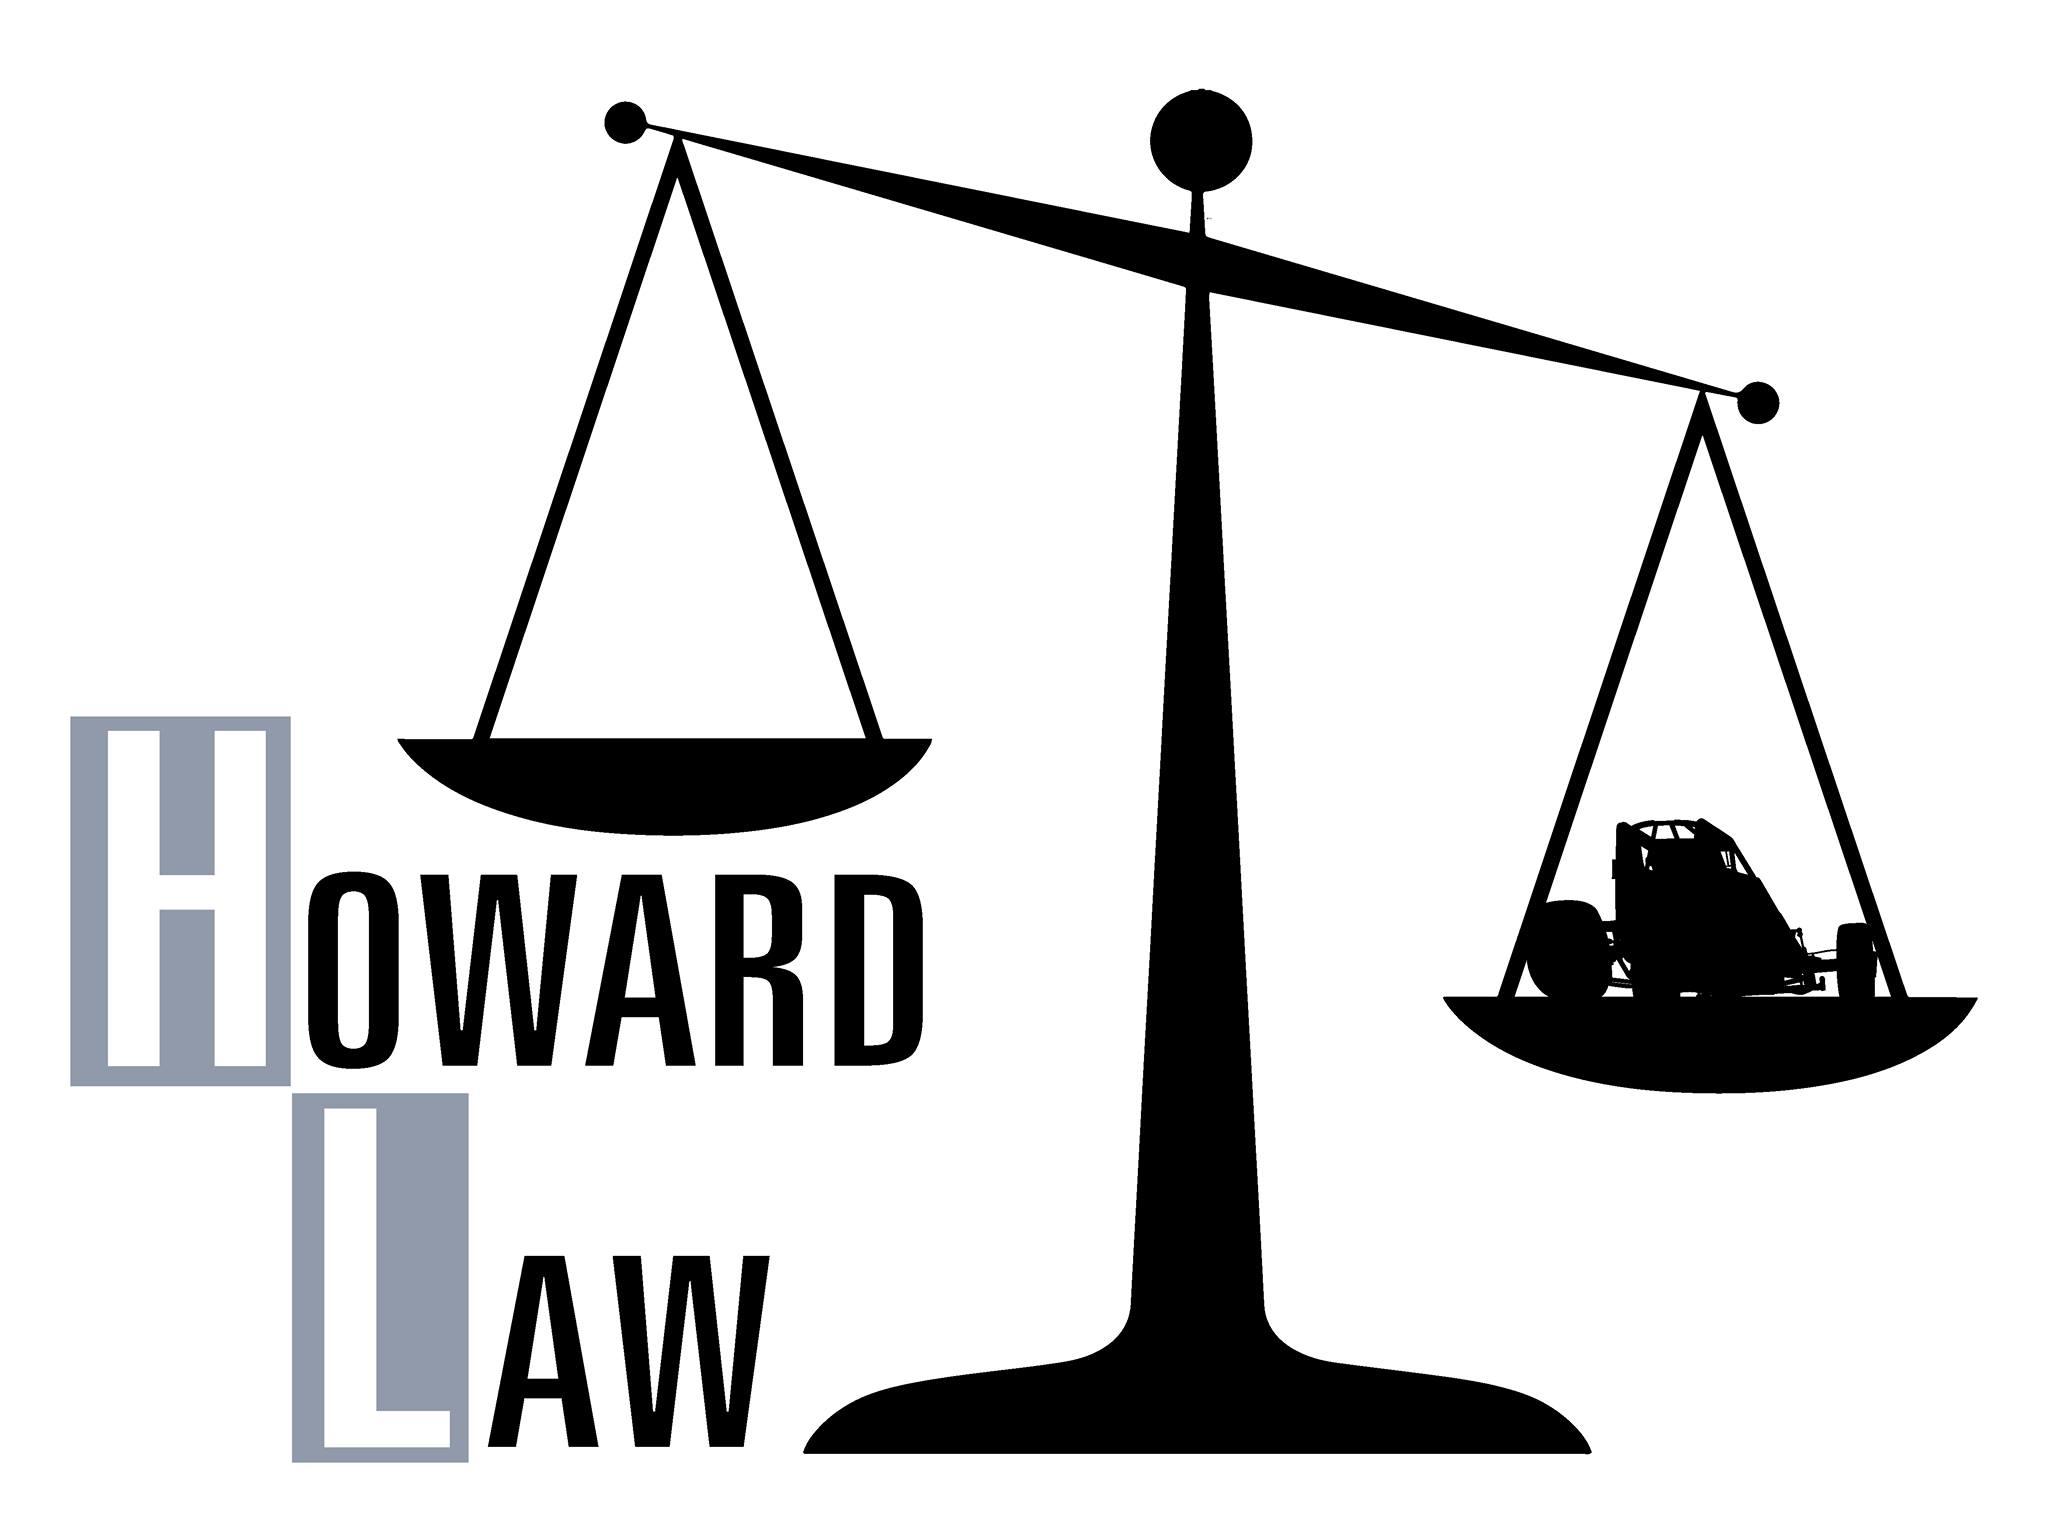 howard law.jpg